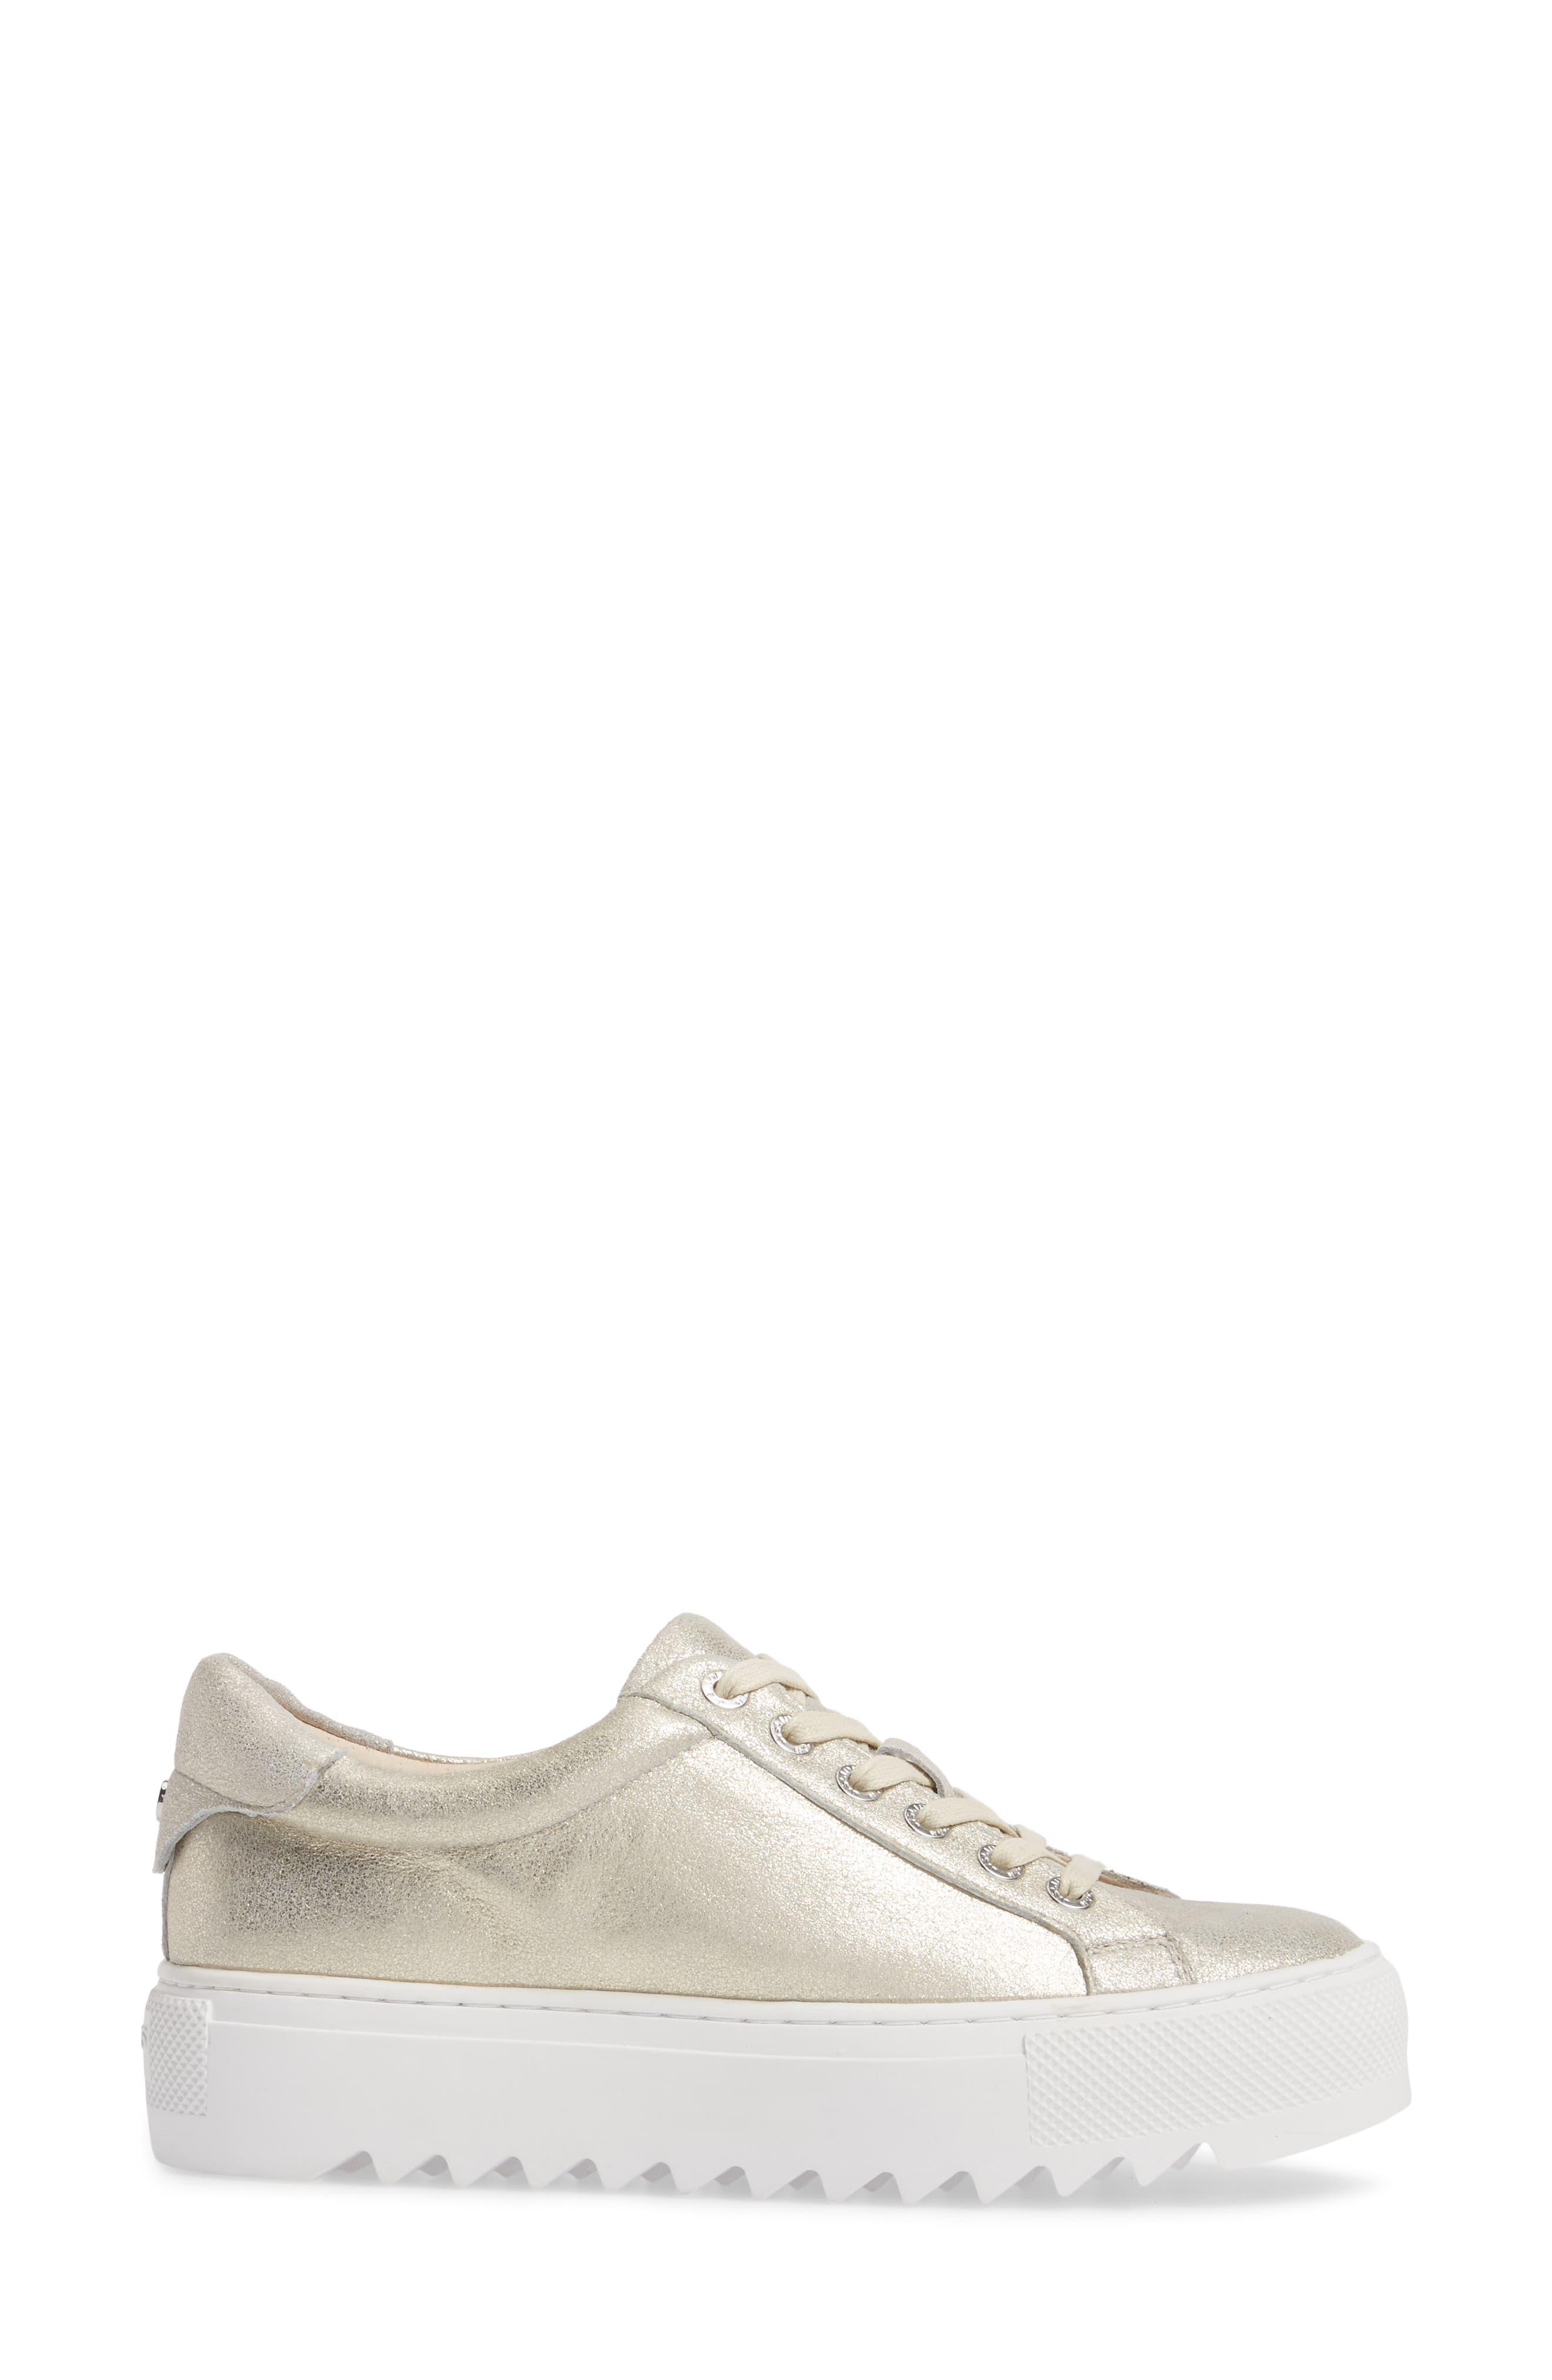 Sapphire Platform Sneaker,                             Alternate thumbnail 3, color,                             Platino Leather